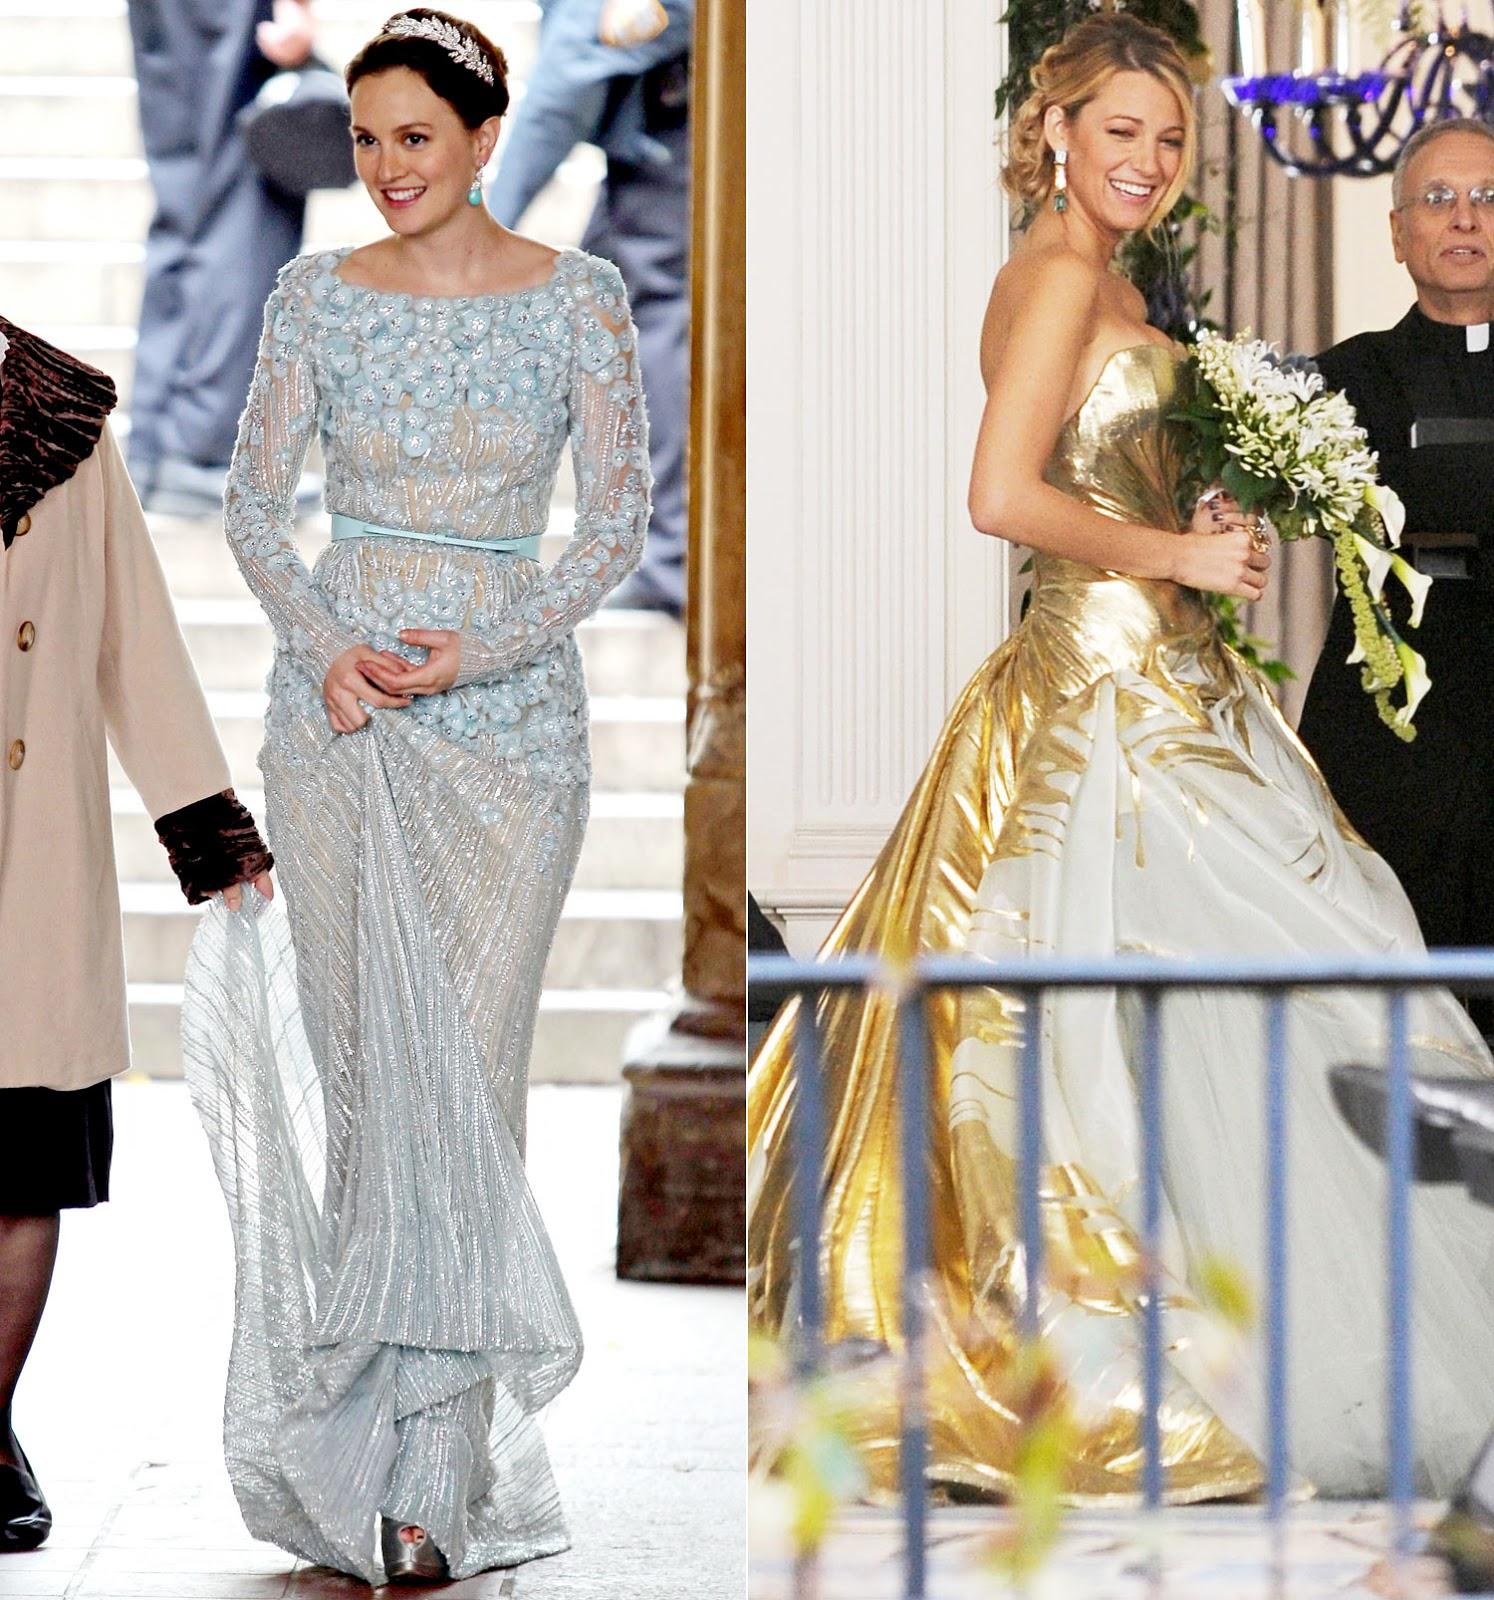 http://4.bp.blogspot.com/-L4KARqQJyPM/UNGz_ujTwwI/AAAAAAAAVik/uSUZetMOFew/s1600/leighton-meester-blake-lively-finale-dresses.jpg